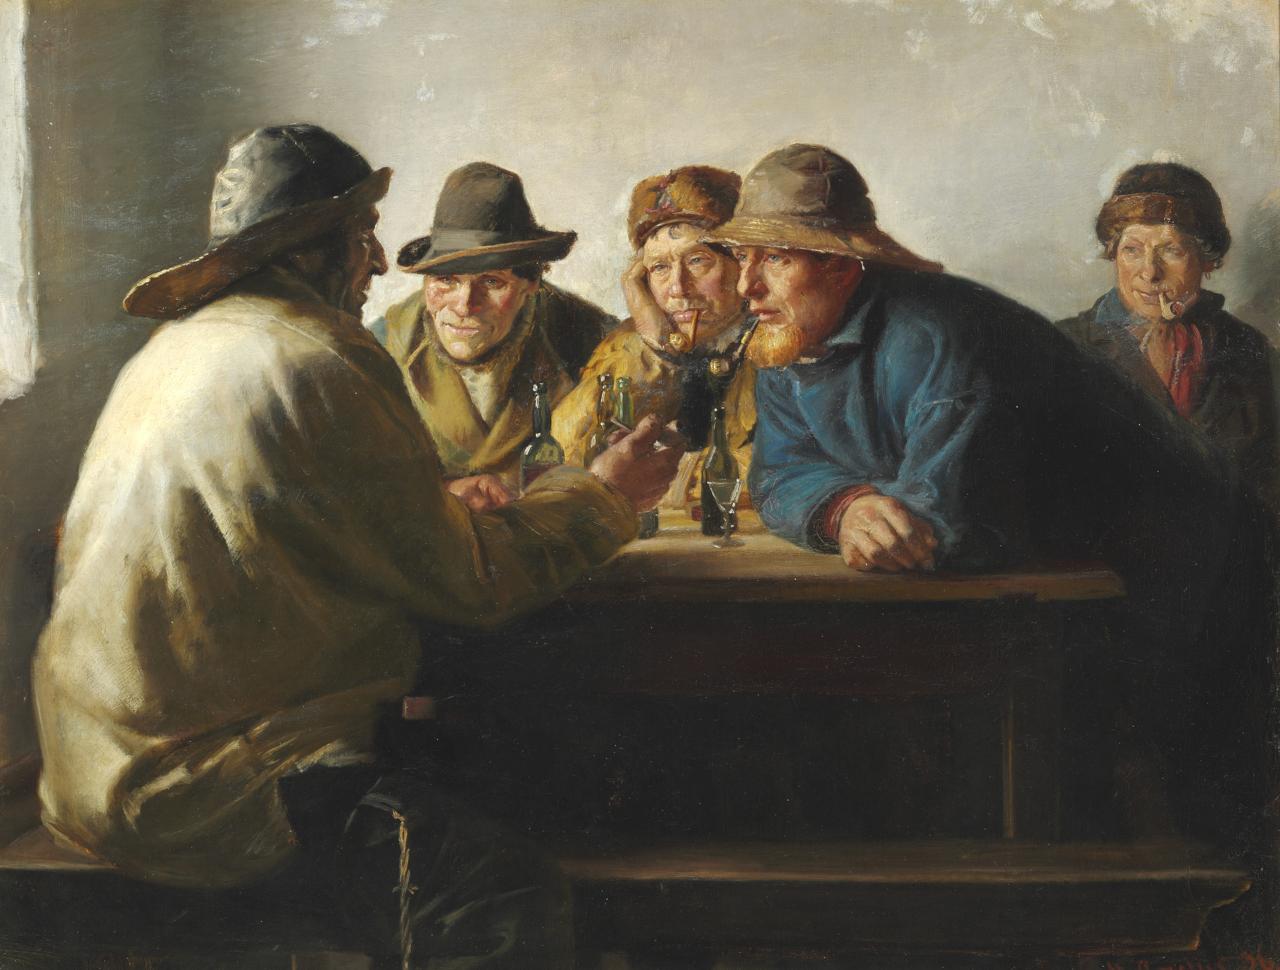 Michael Peter Ancher